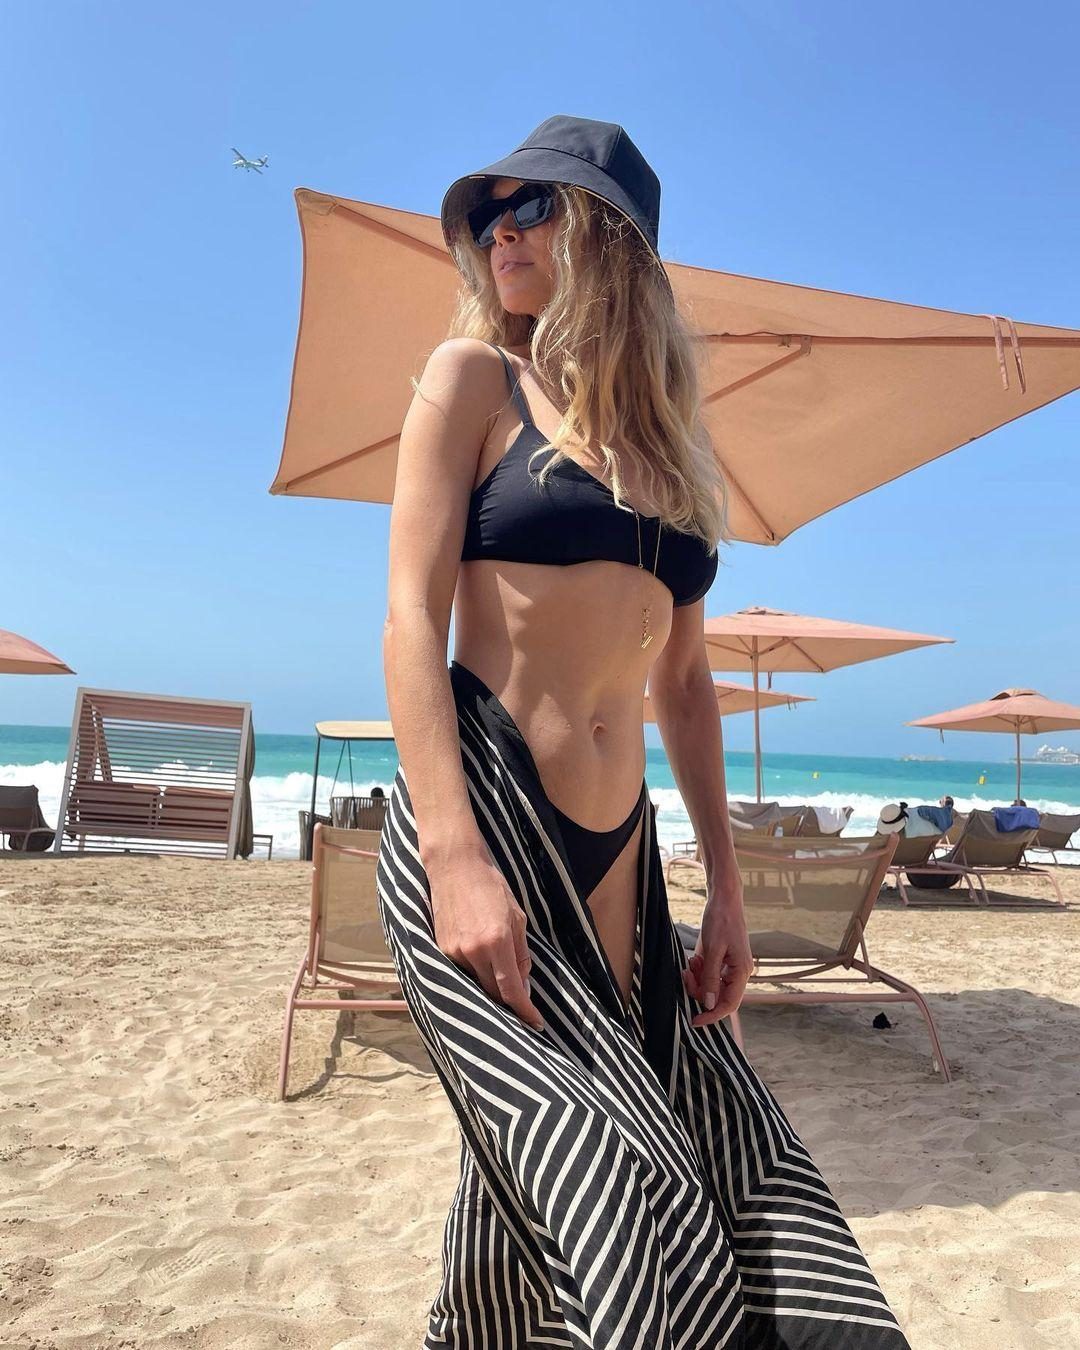 Брежнева показала фигуру / instagram.com/ververa